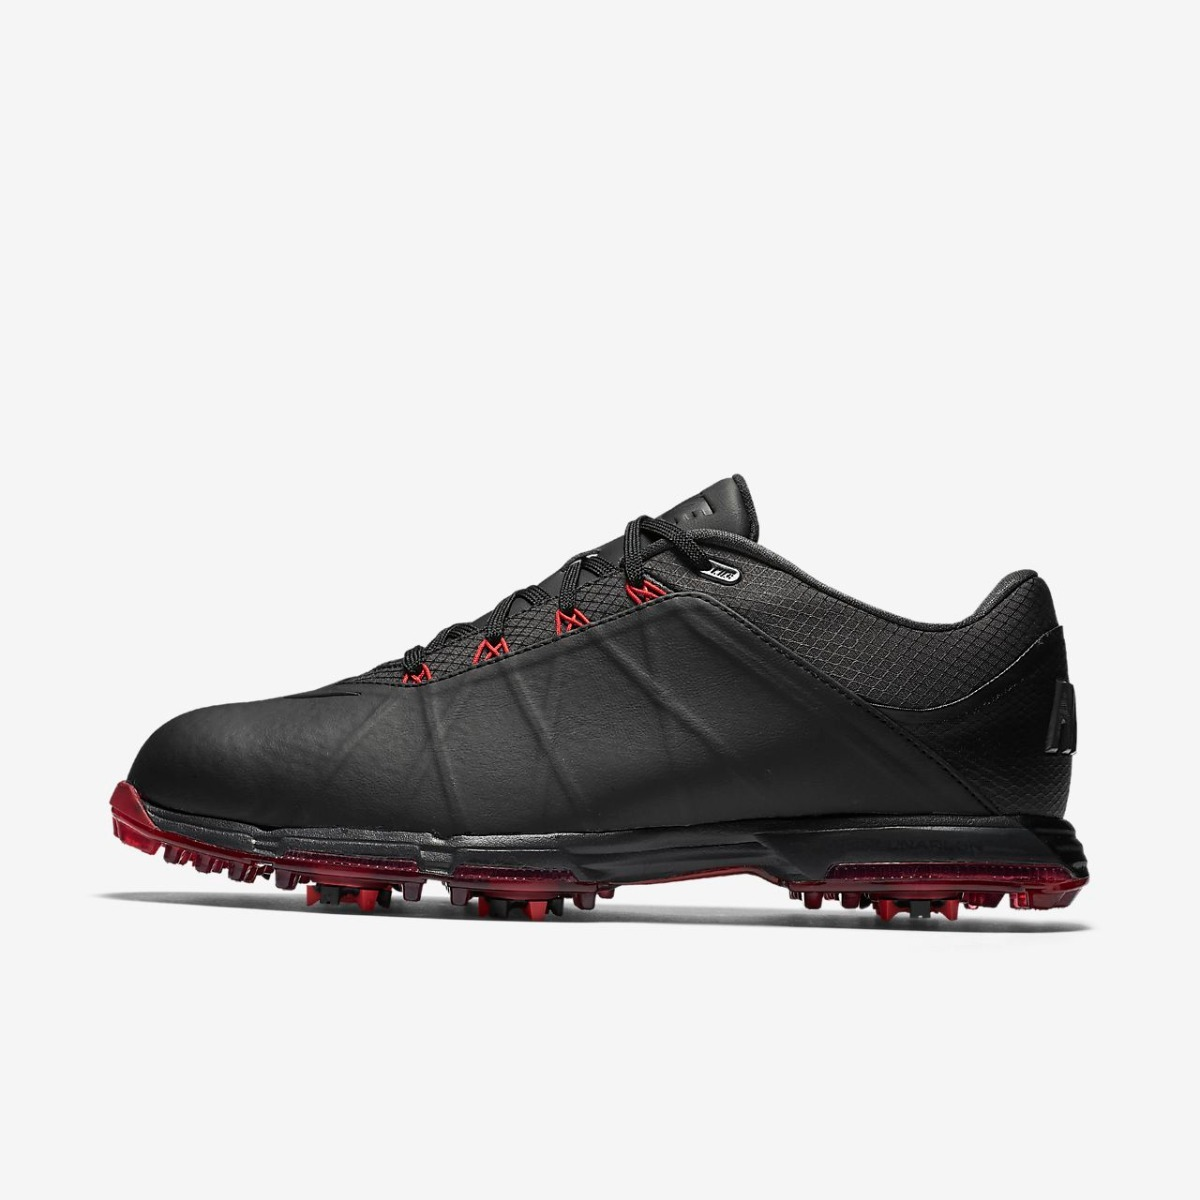 new product 625ac 9bd1b zapatos para golf nike lunar fire ¡¡ oferta !! núm. 27.5. Cargando zoom.